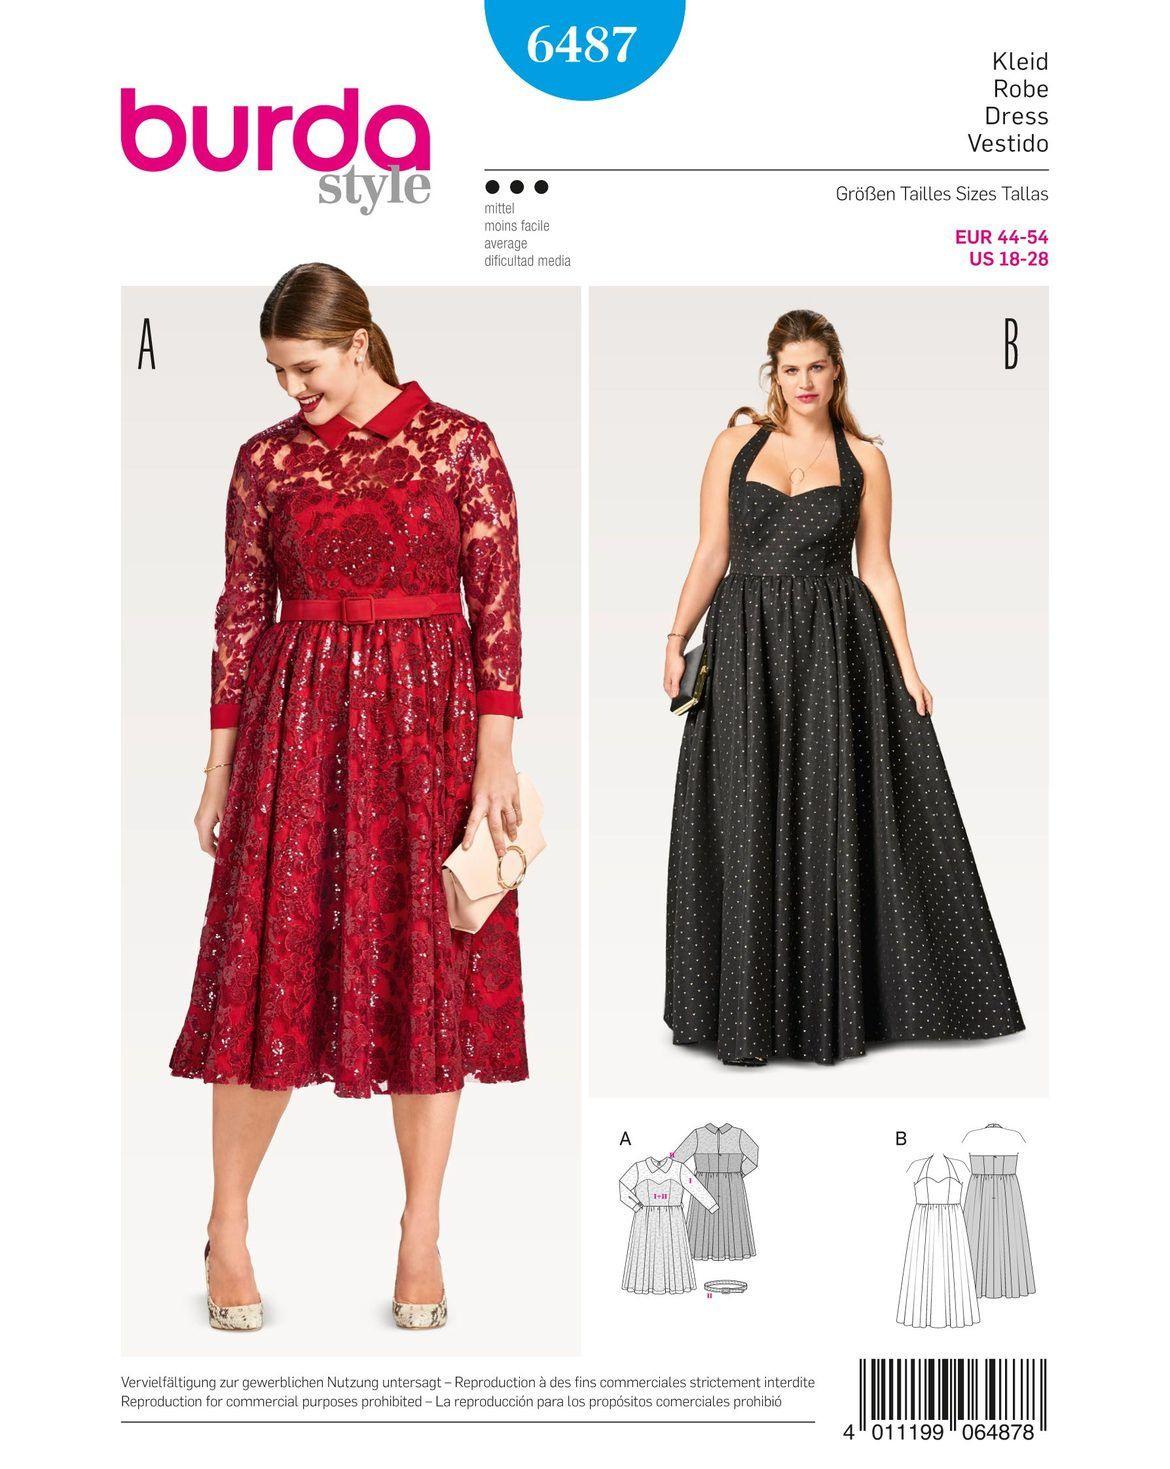 17 Wunderbar Abendkleid Schnittmuster Boutique17 Genial Abendkleid Schnittmuster Stylish